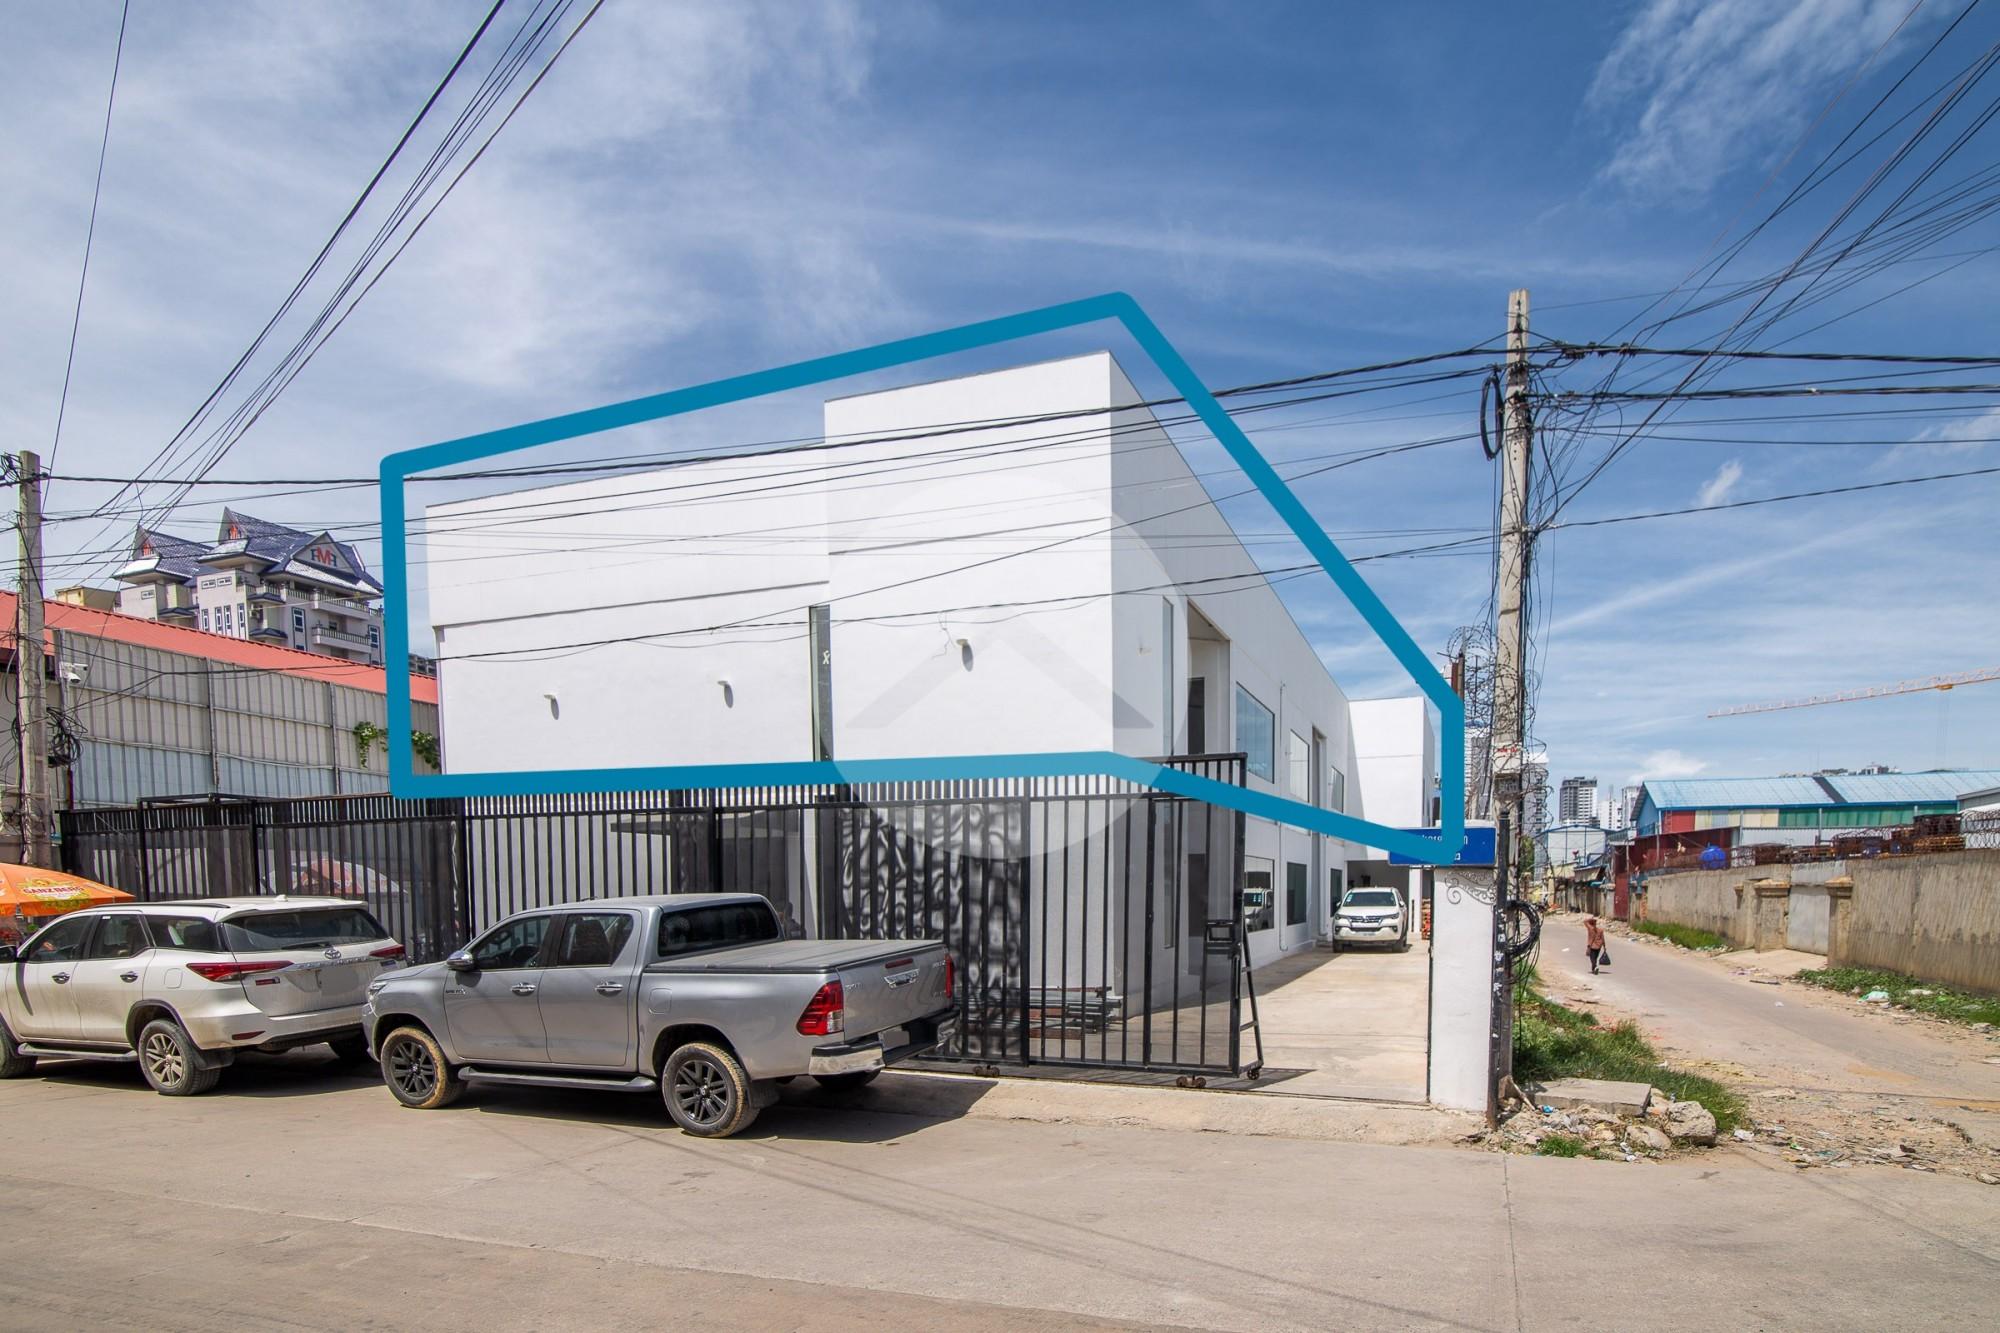 370 Sqm Commercial Space For Rent - Toul Tum Poung 1, Phnom Penh